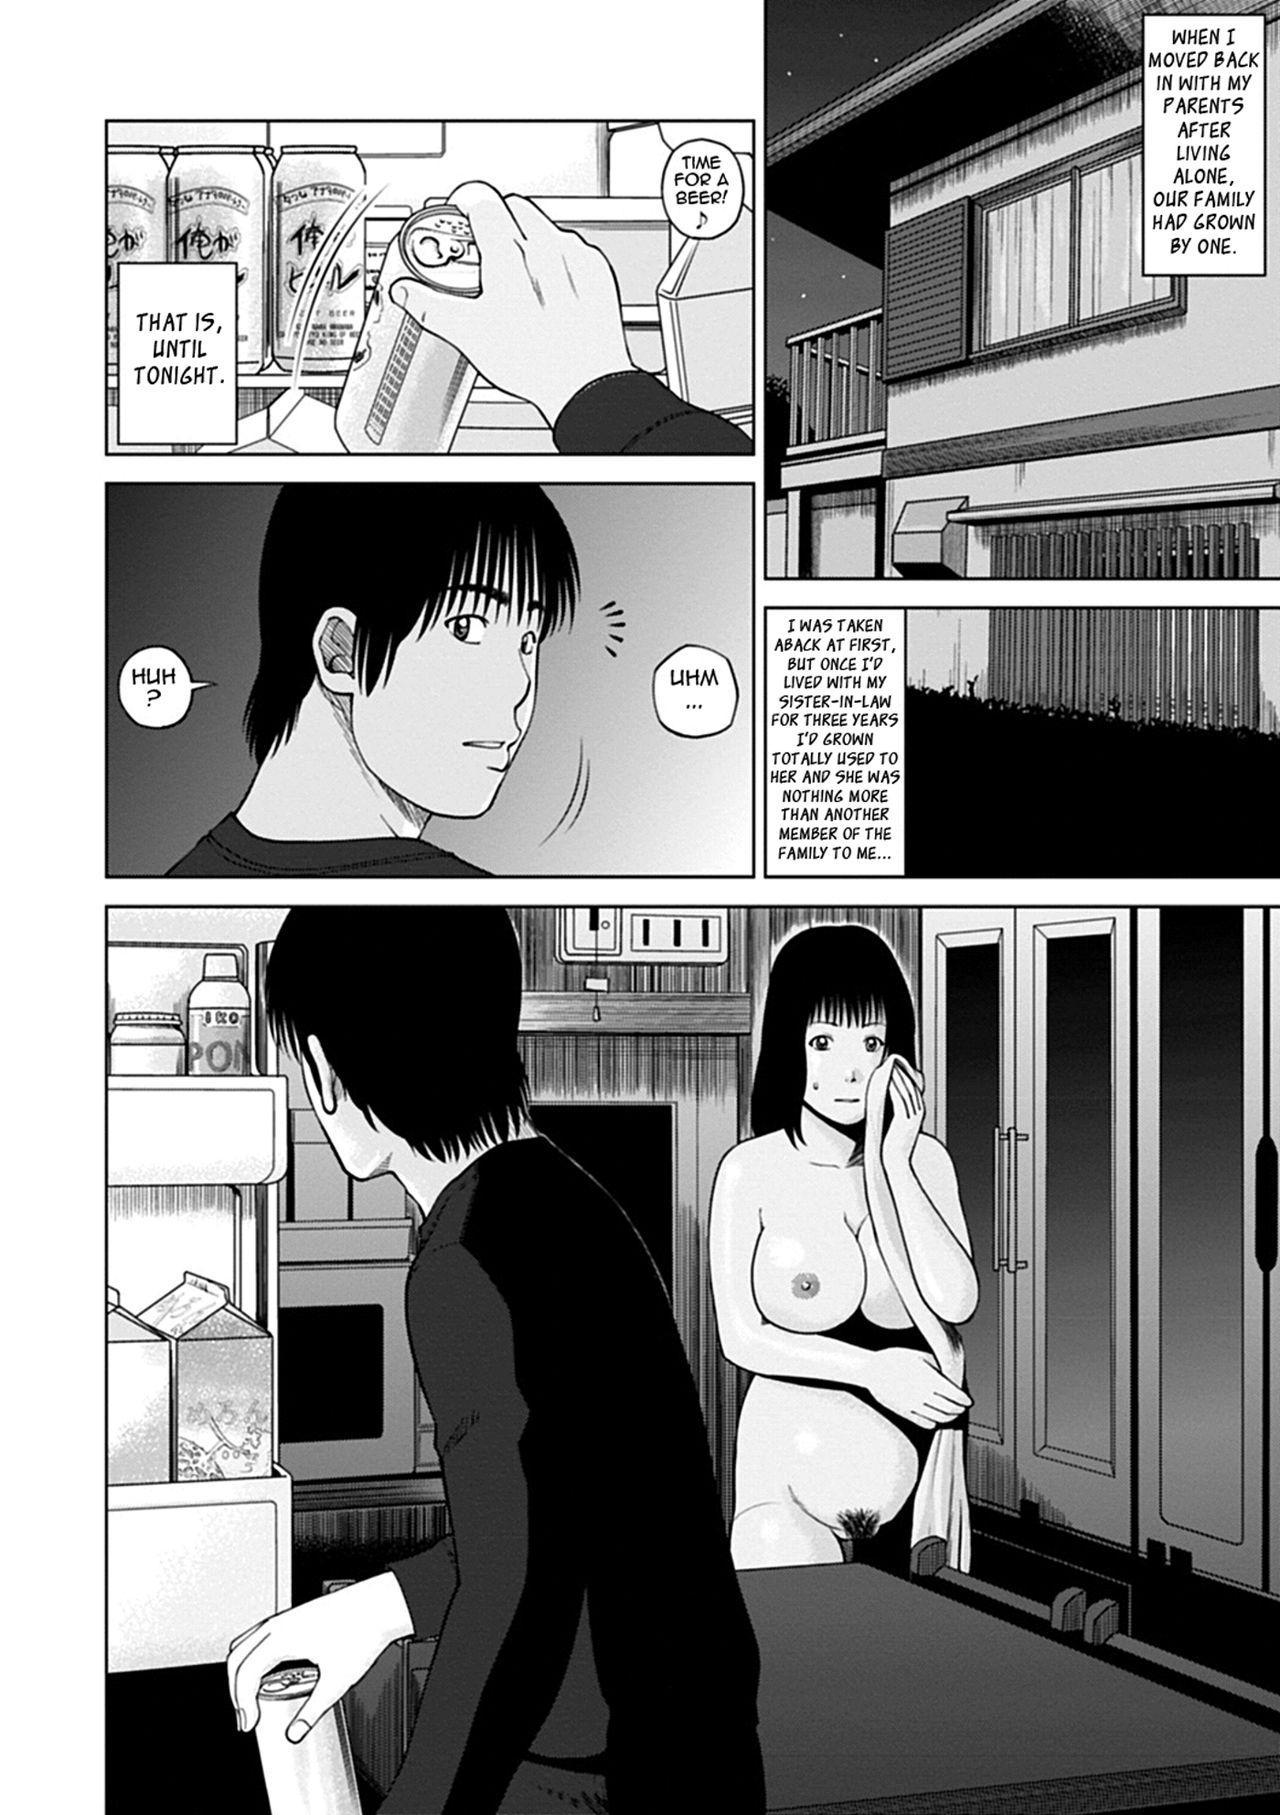 [Kuroki Hidehiko] 36-sai Injuku Sakarizuma | 36-Year-Old Randy Mature Wife [English] {Tadanohito} [Digital] [Uncensored] 39